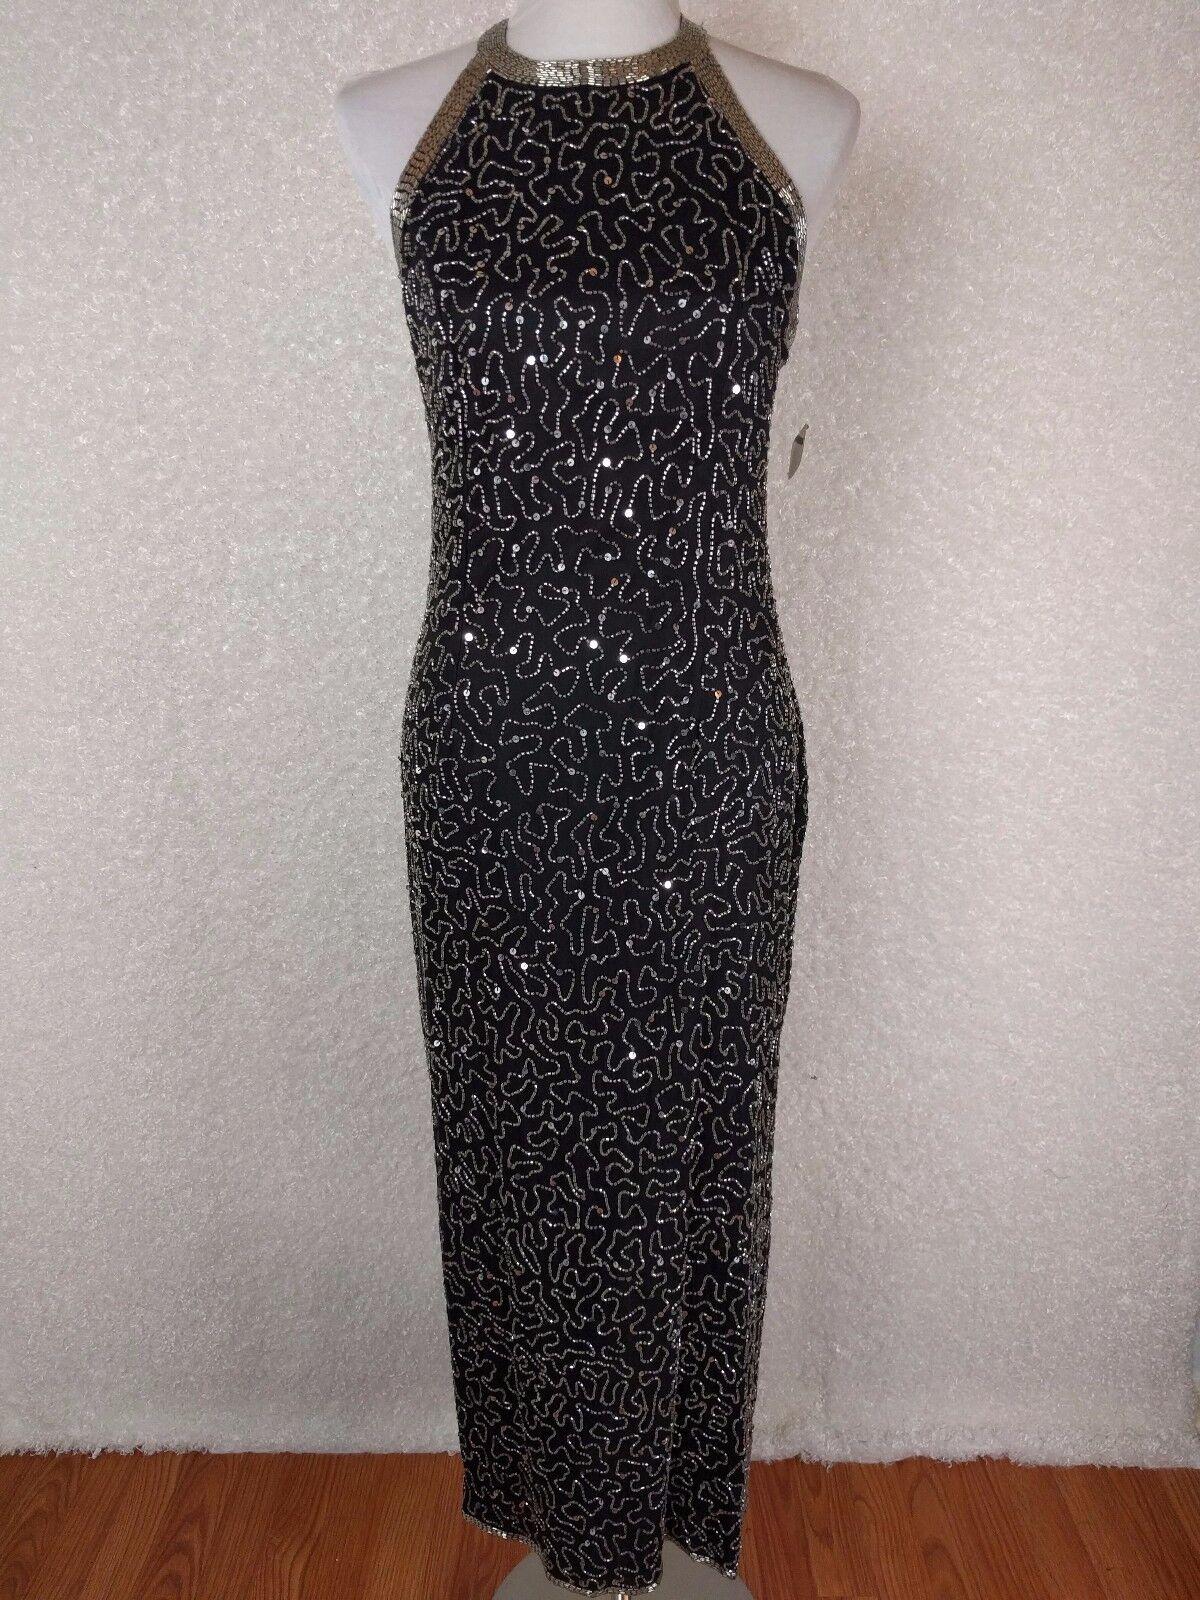 Laurence Kazar damen Gown PL schwarz Beaded Sequin Silk Full Length Dress Vintage